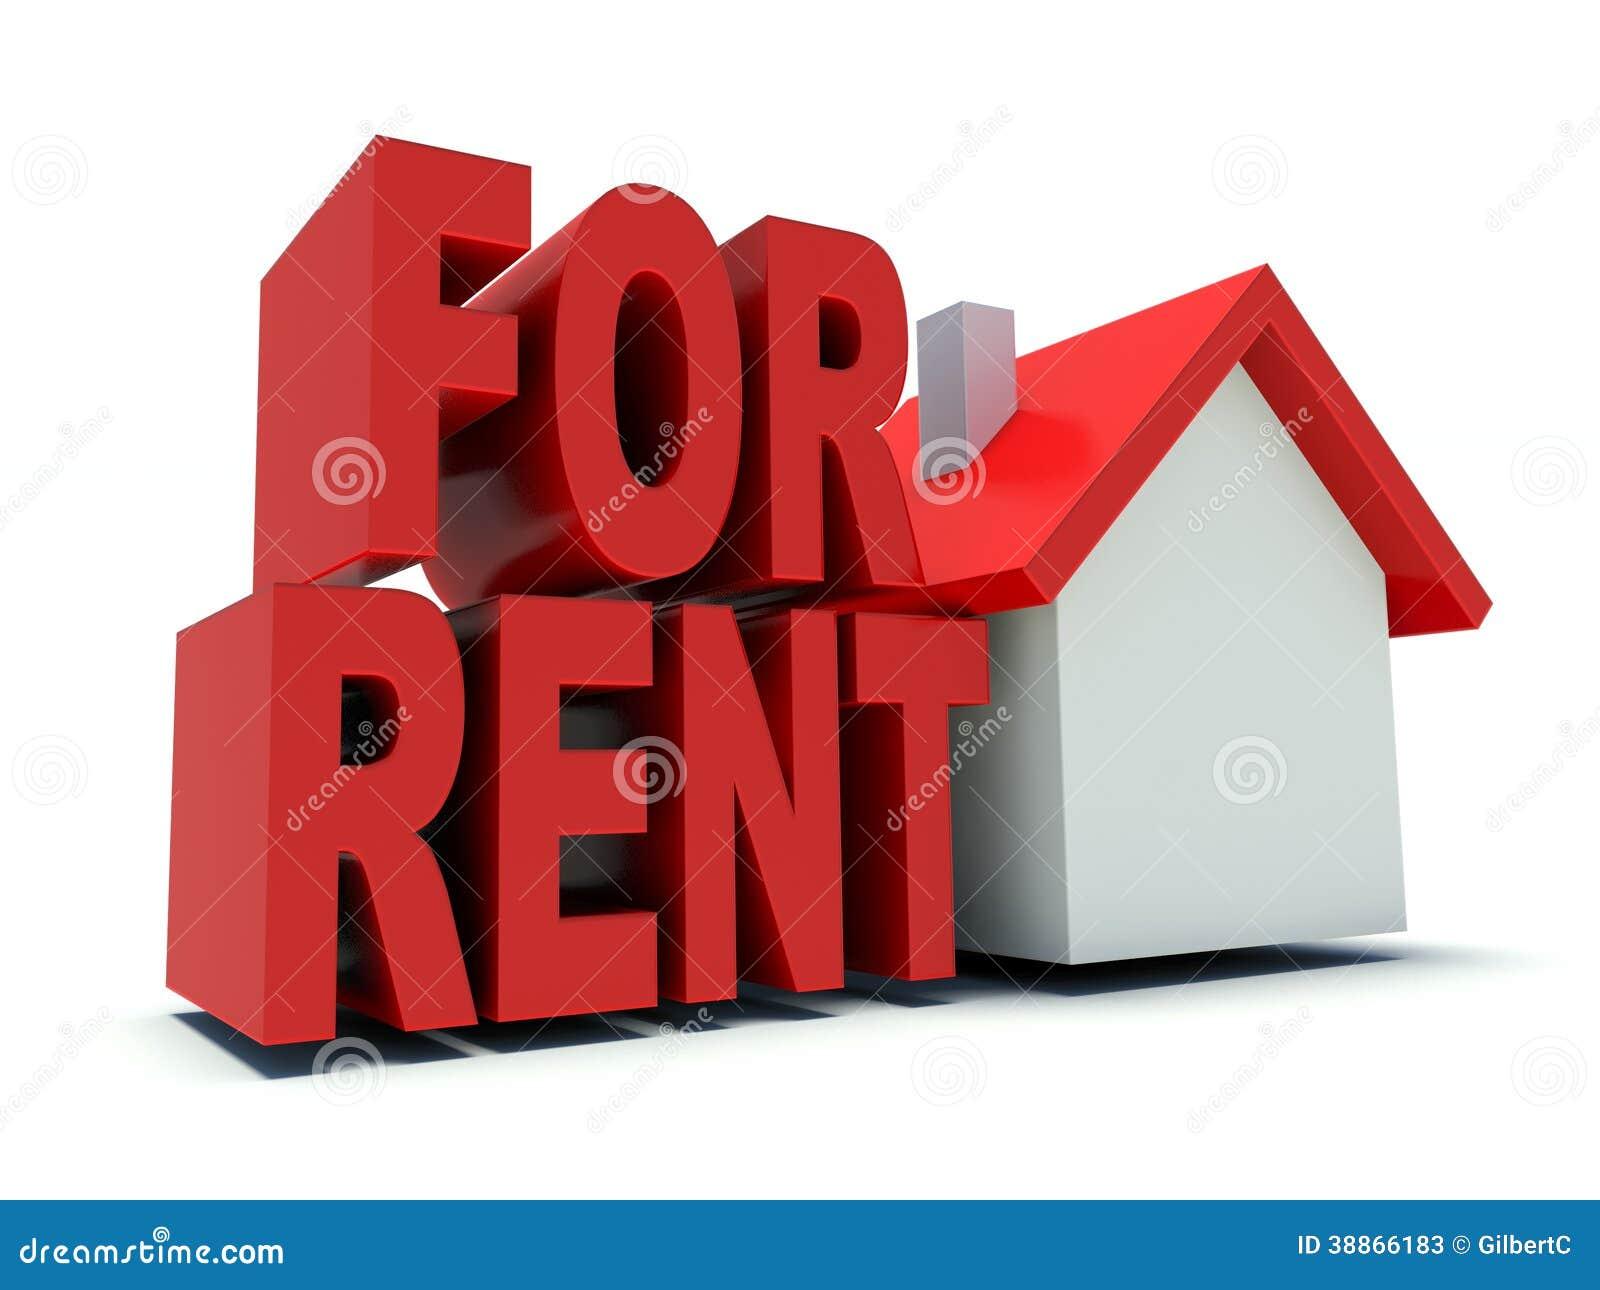 House For Rent Stock Illustration - Image: 38866183